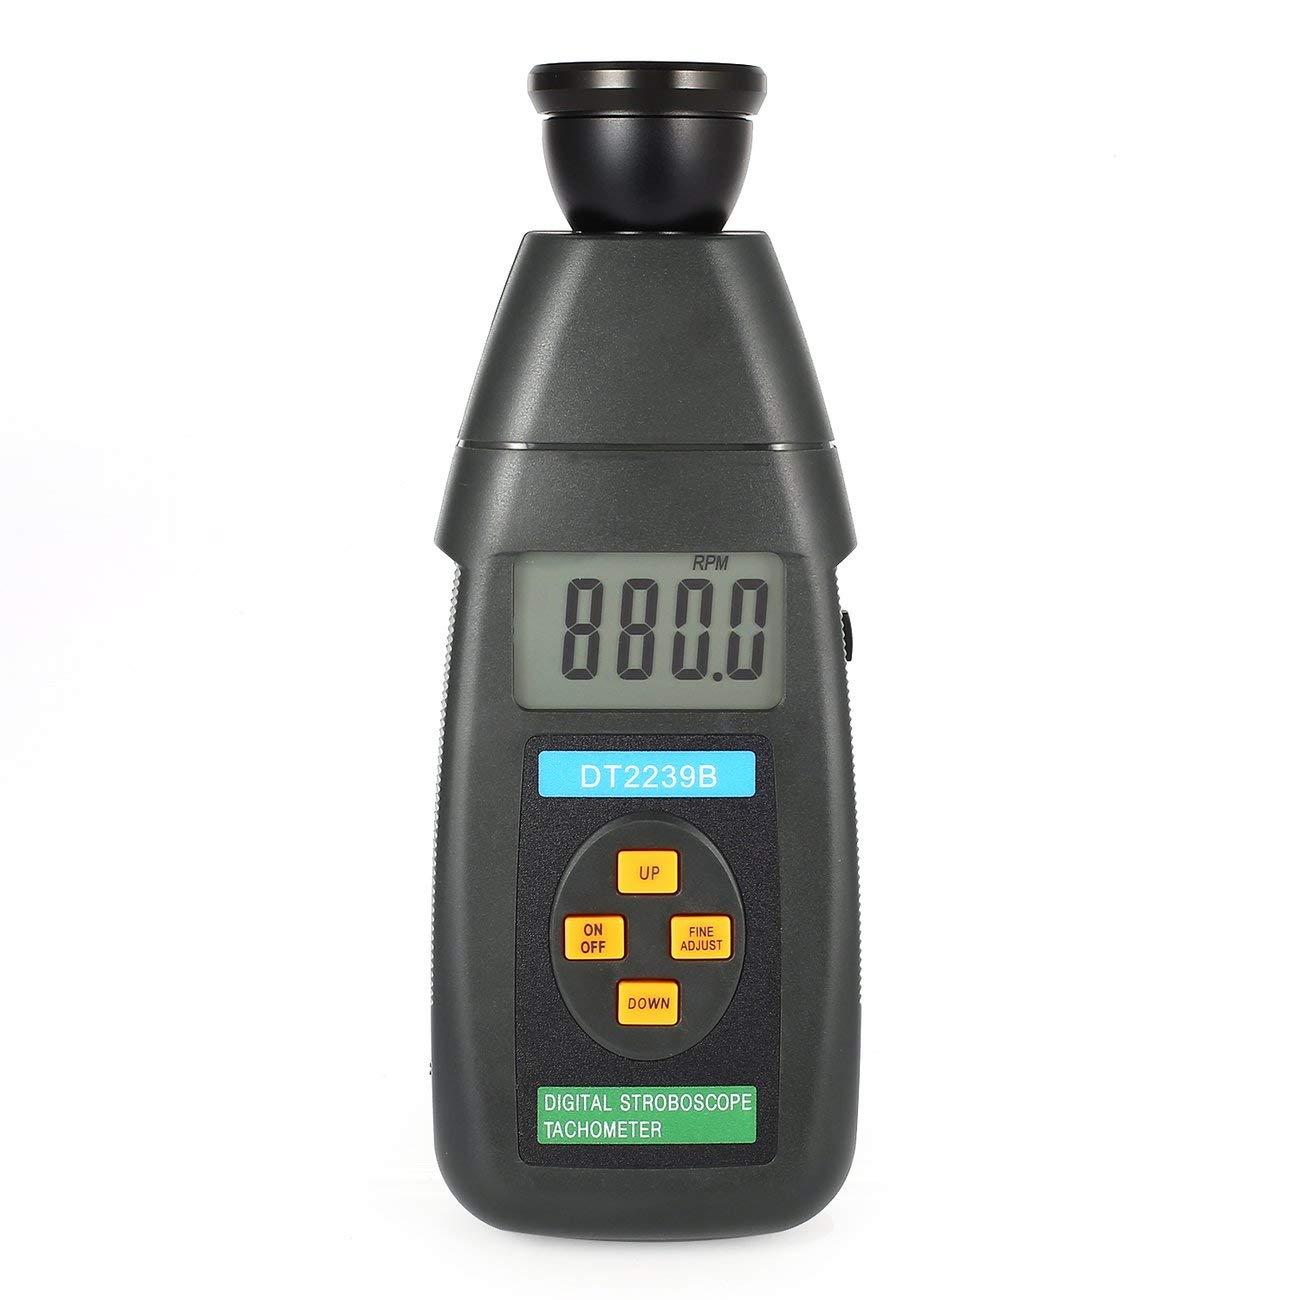 DT2239B Digital Non-Contact Flash Stroboscope